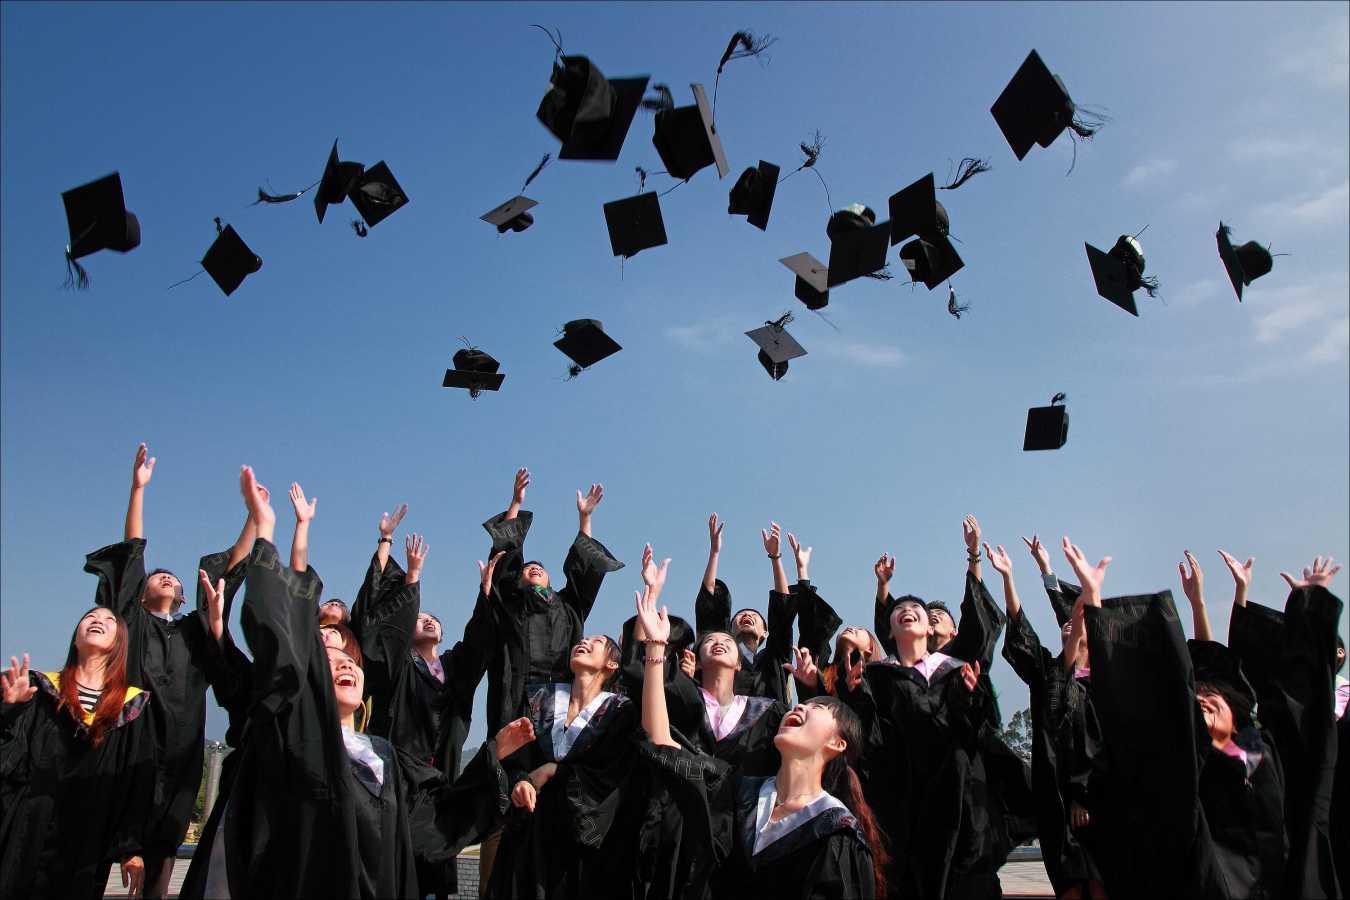 Digital Marketing for Colleges